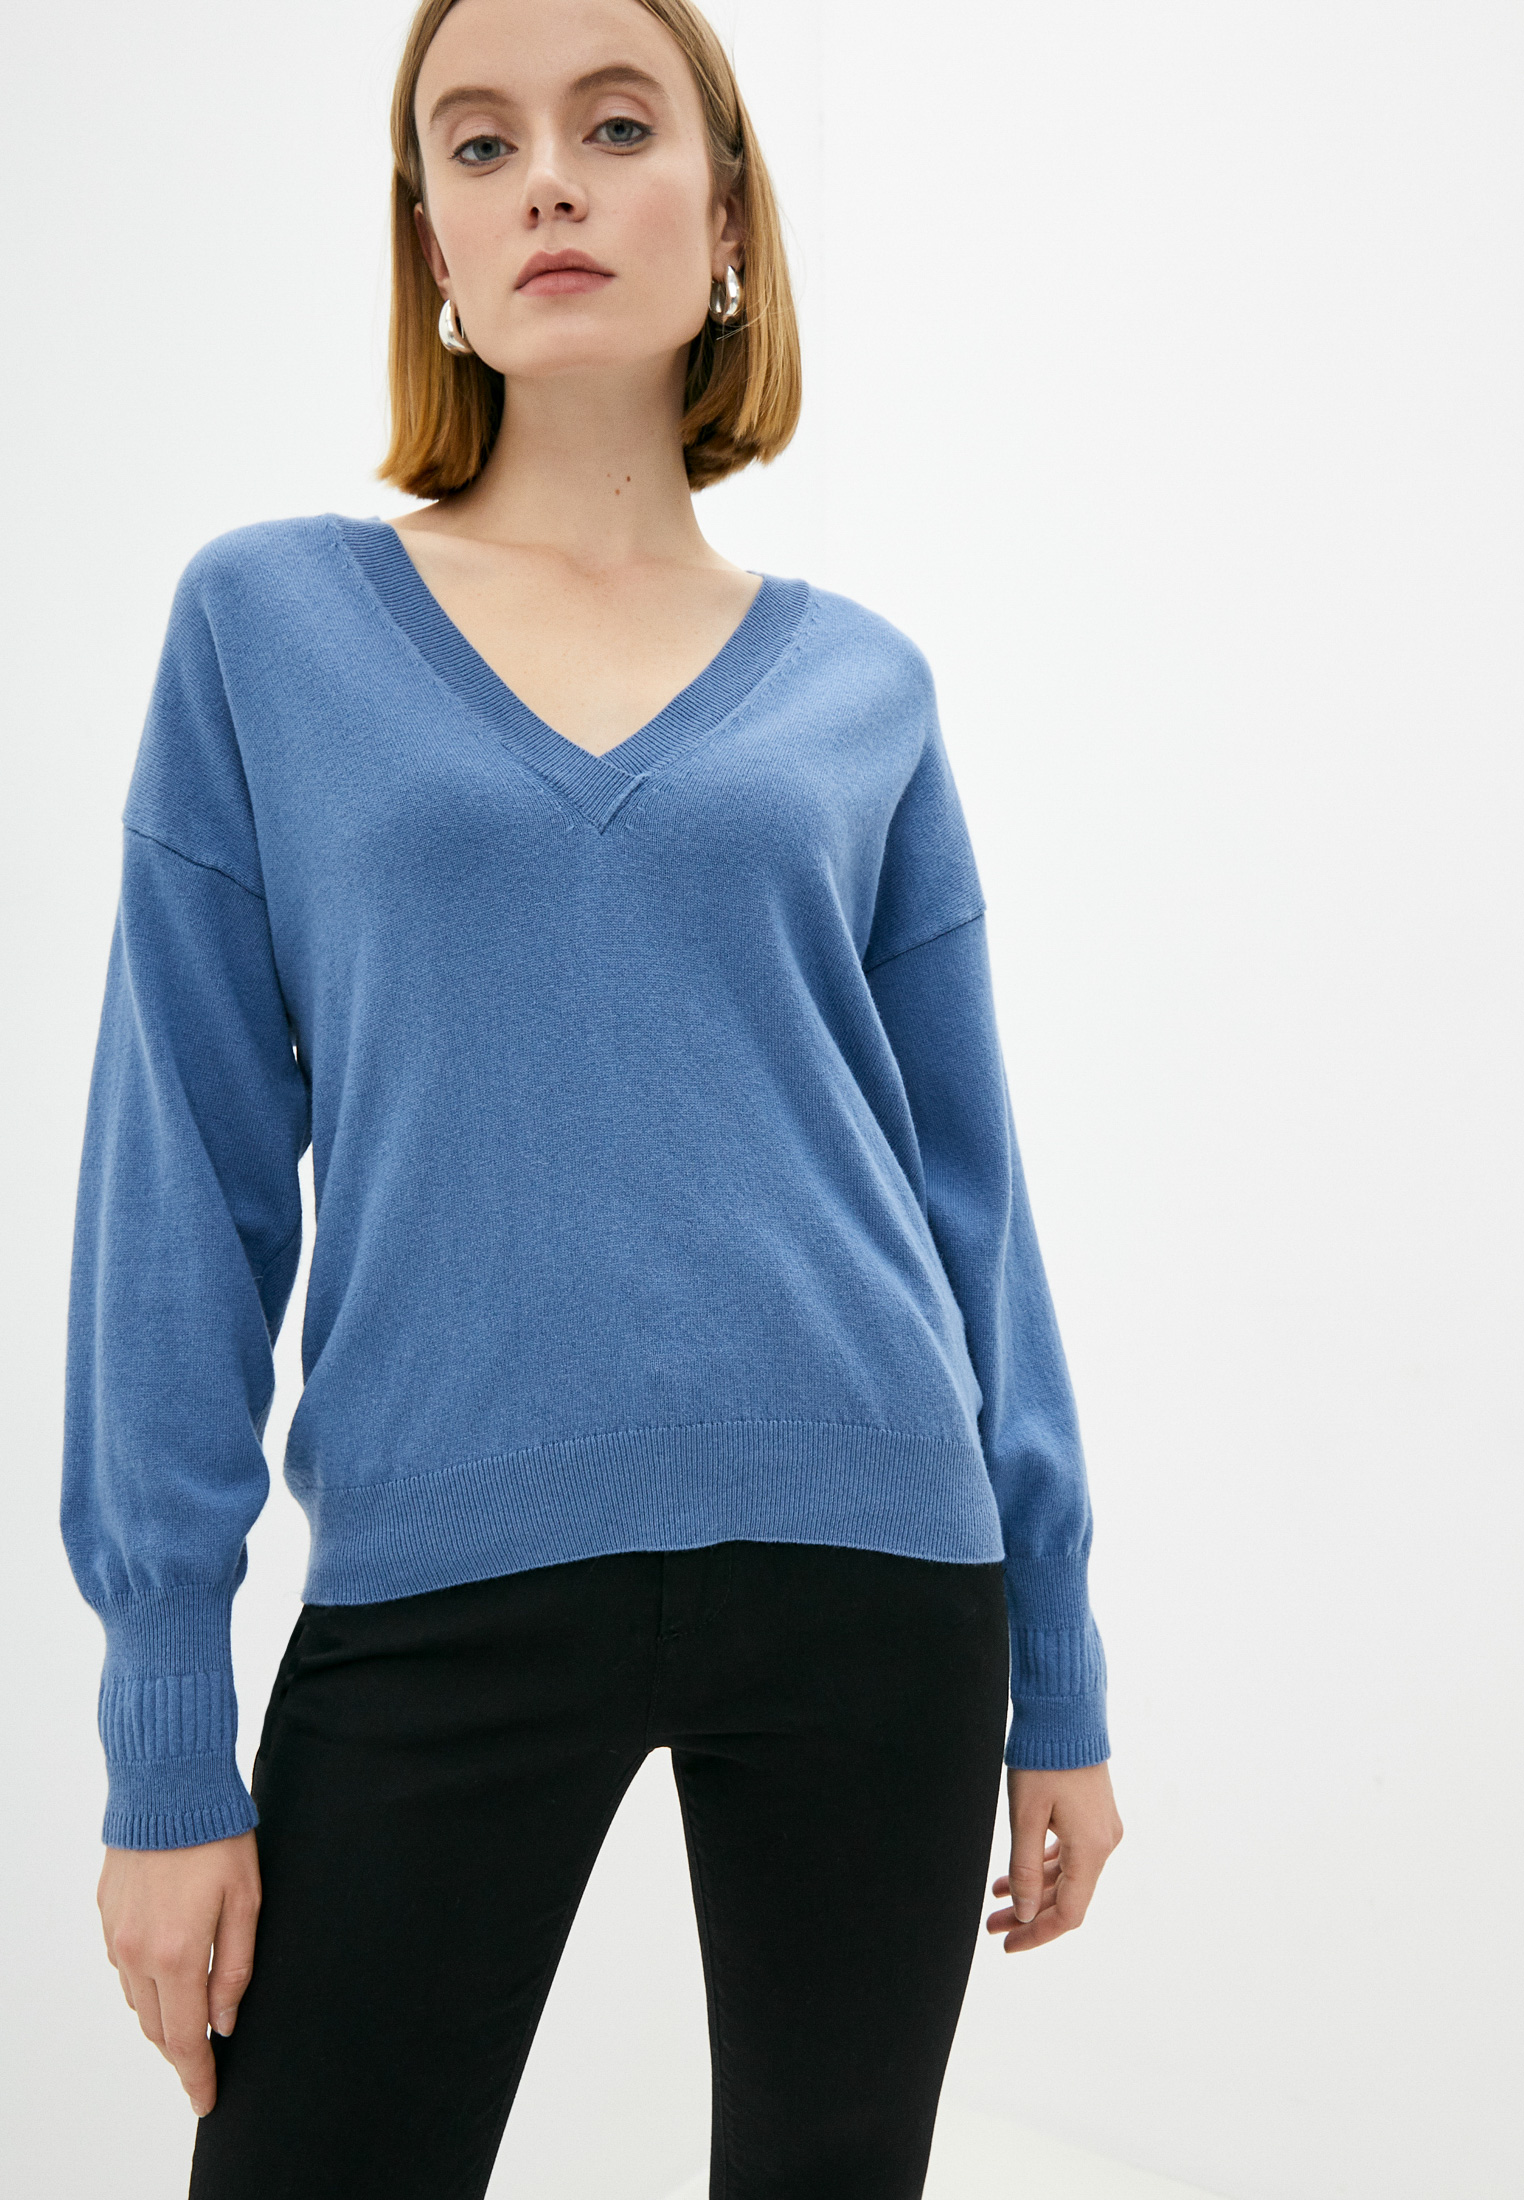 Пуловер Sisley (Сислей) Пуловер Sisley